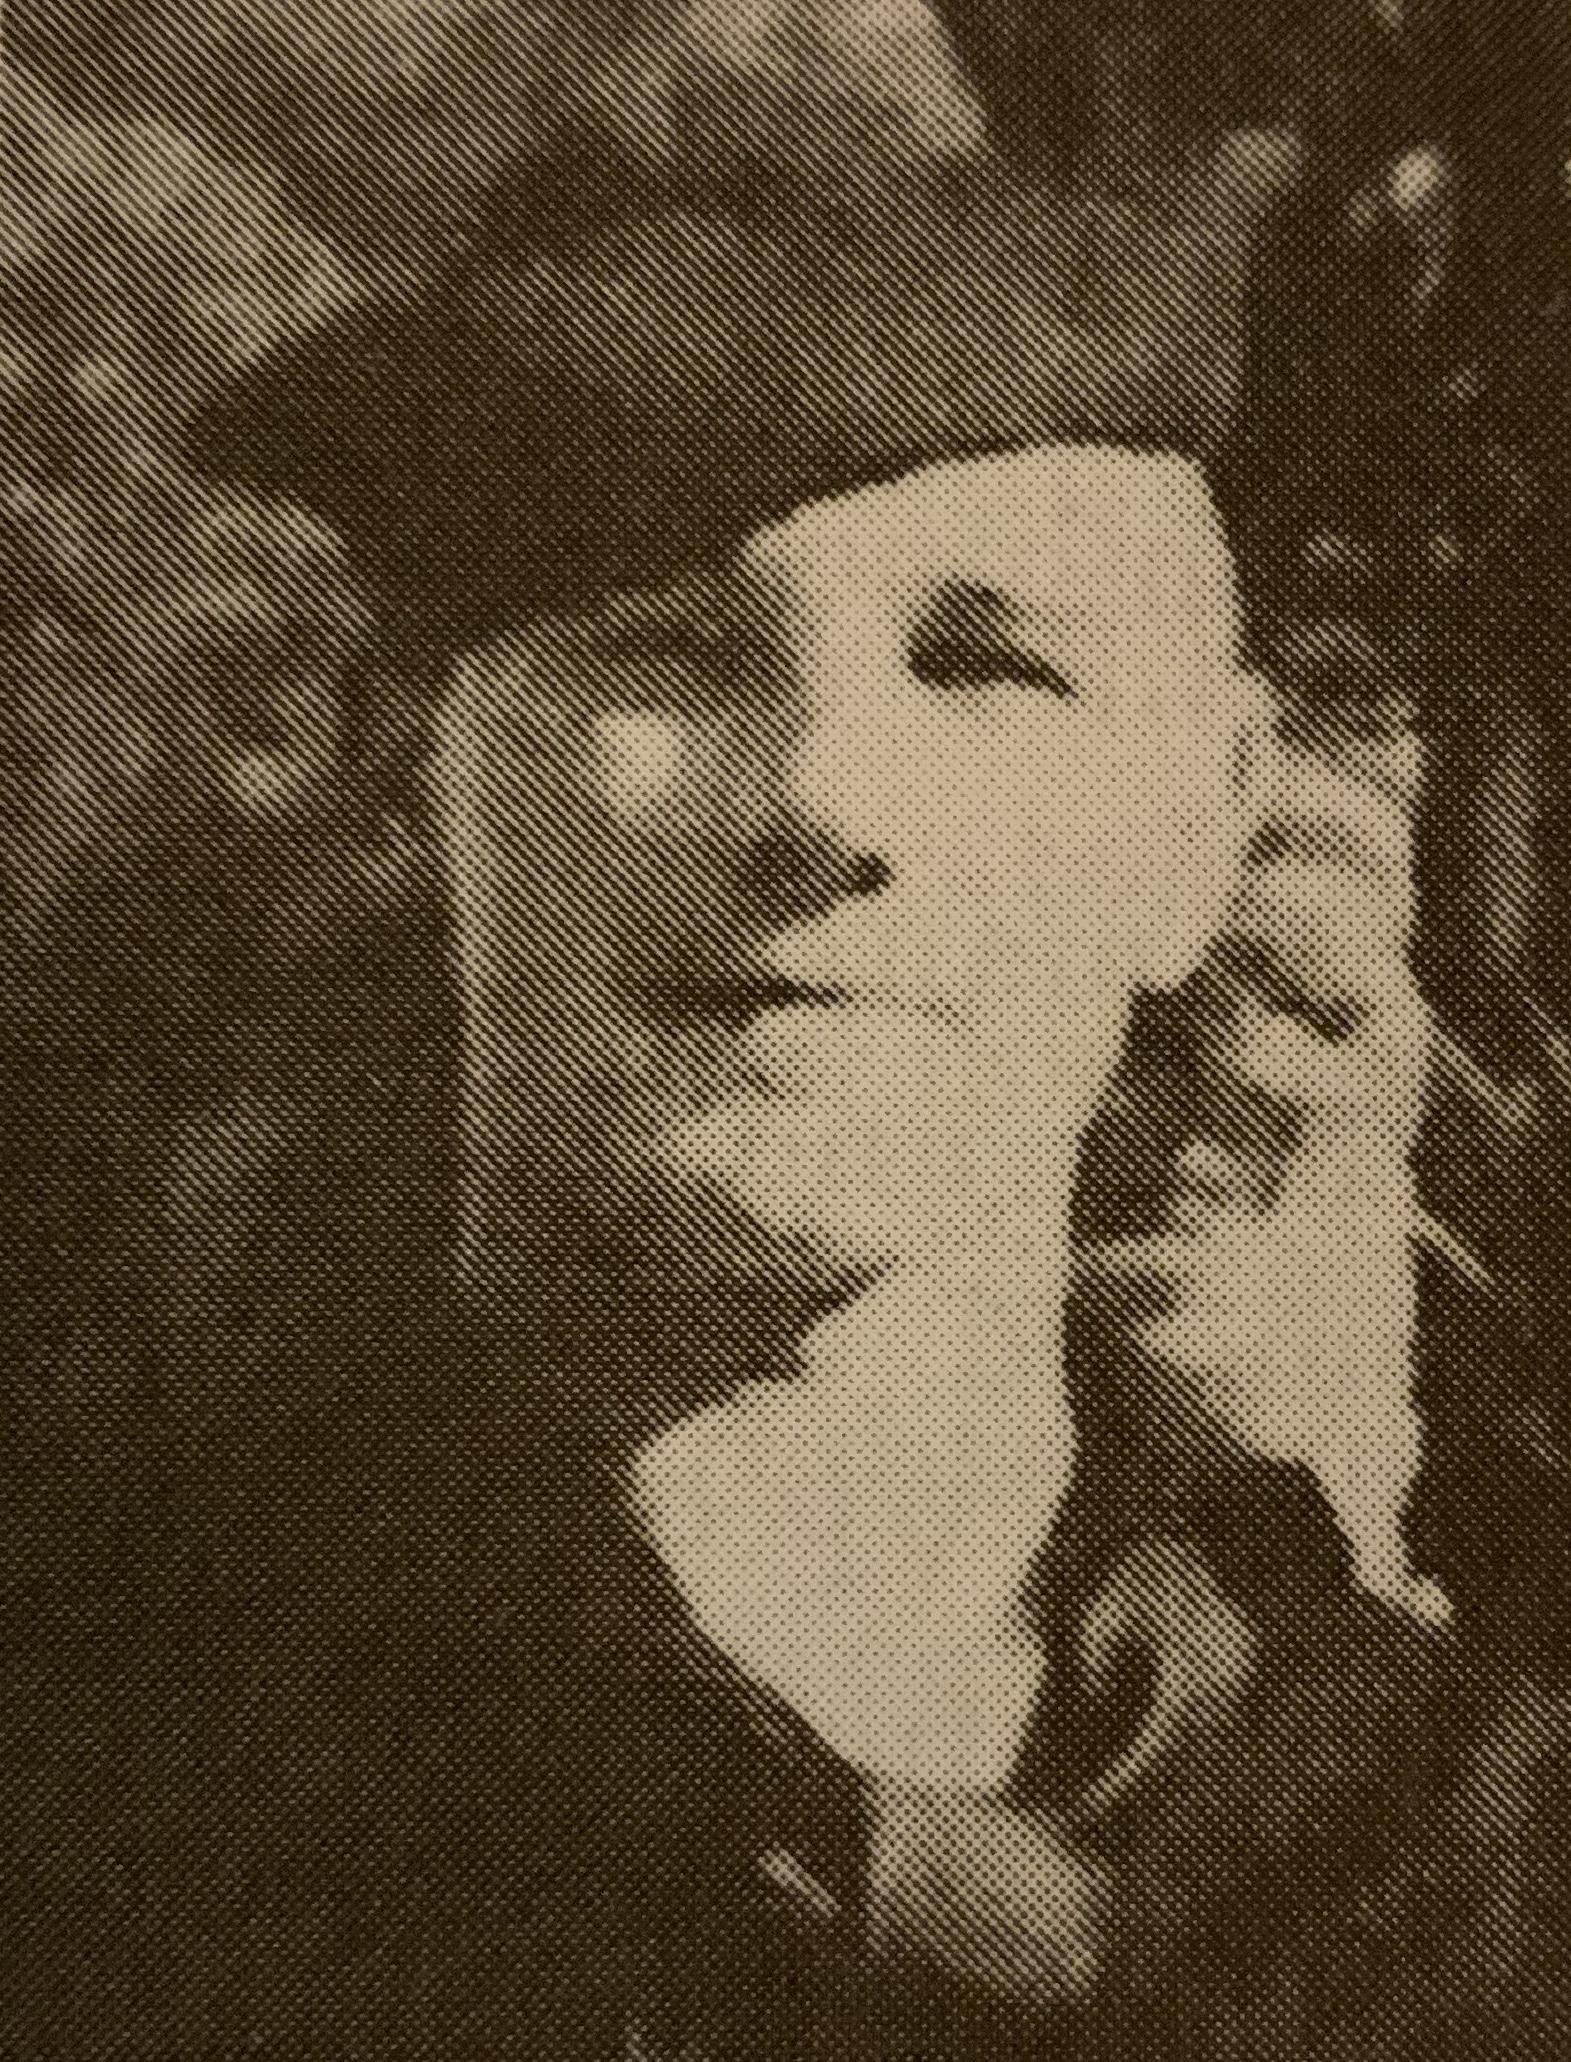 Bob Cauble - WWII - Merchant Marine